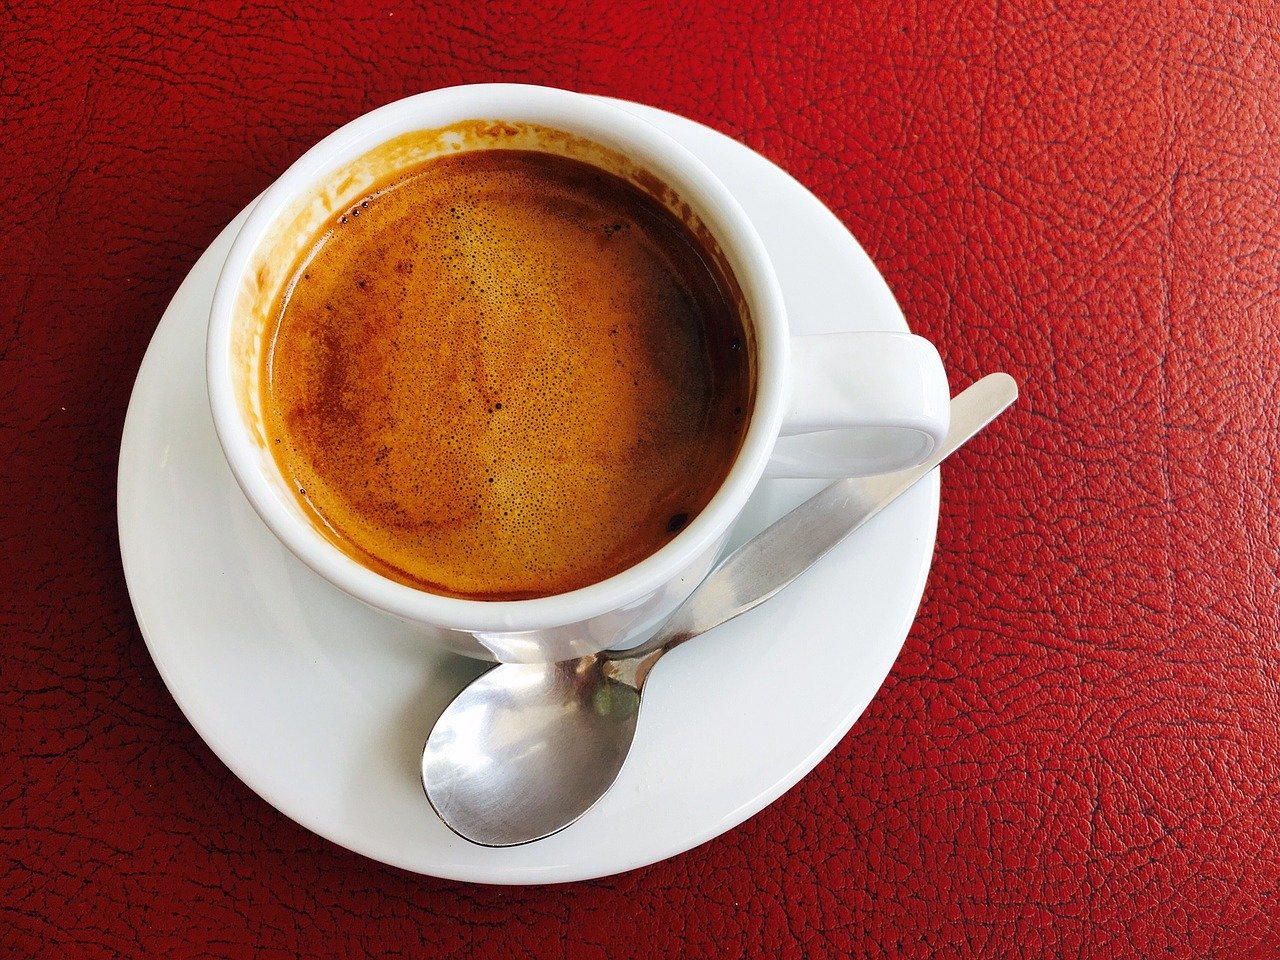 Cafe Americano Zubereitung